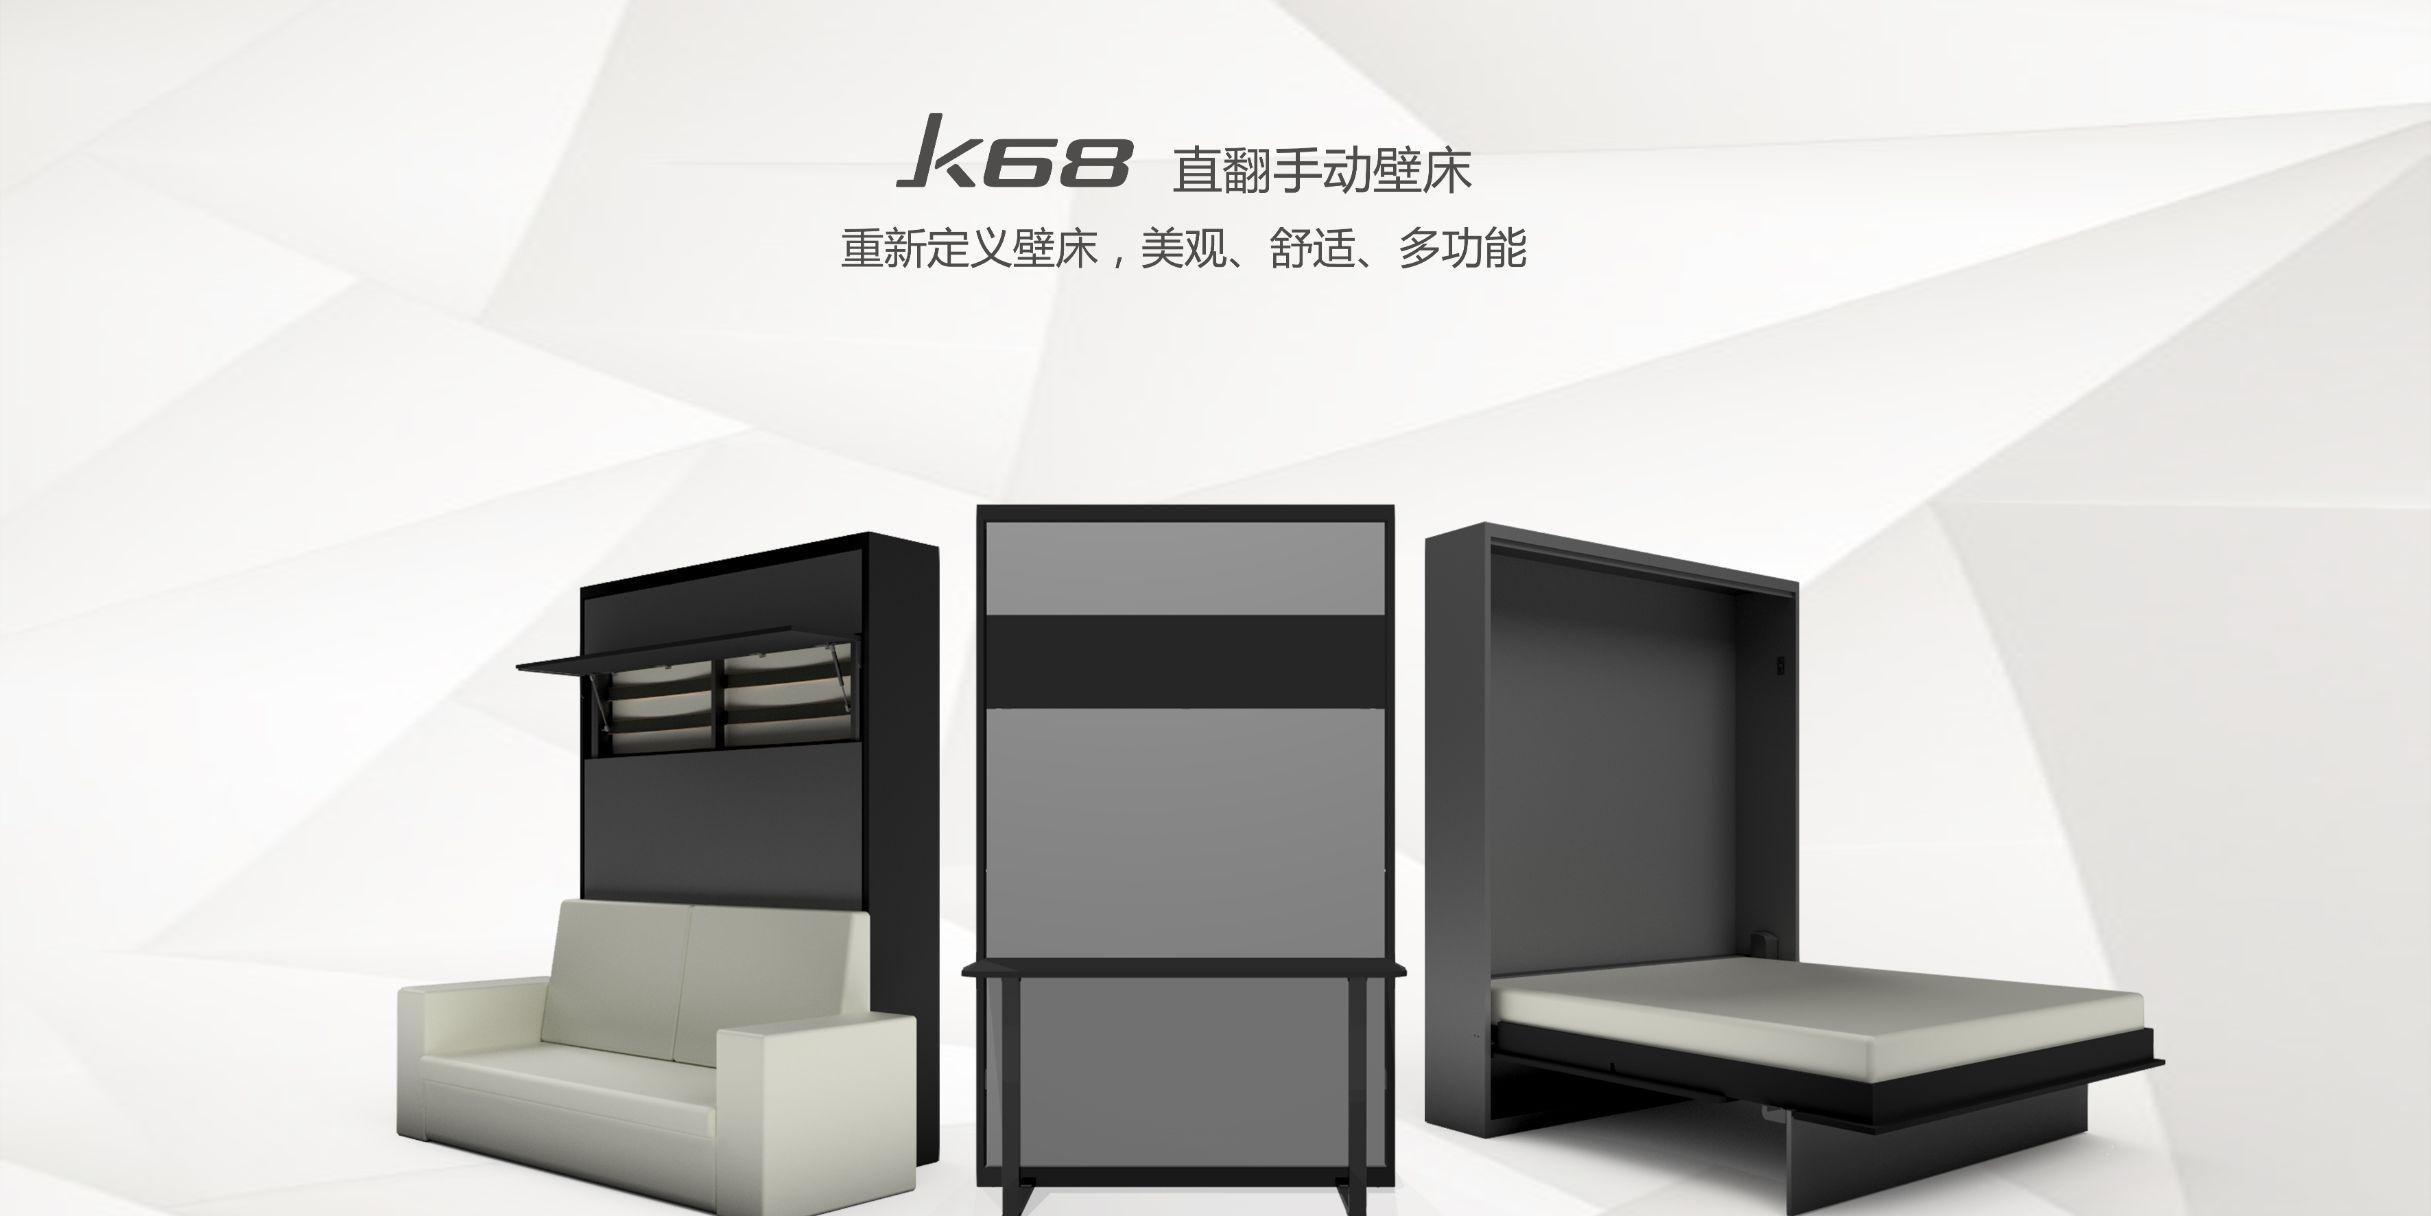 K68手动首页图